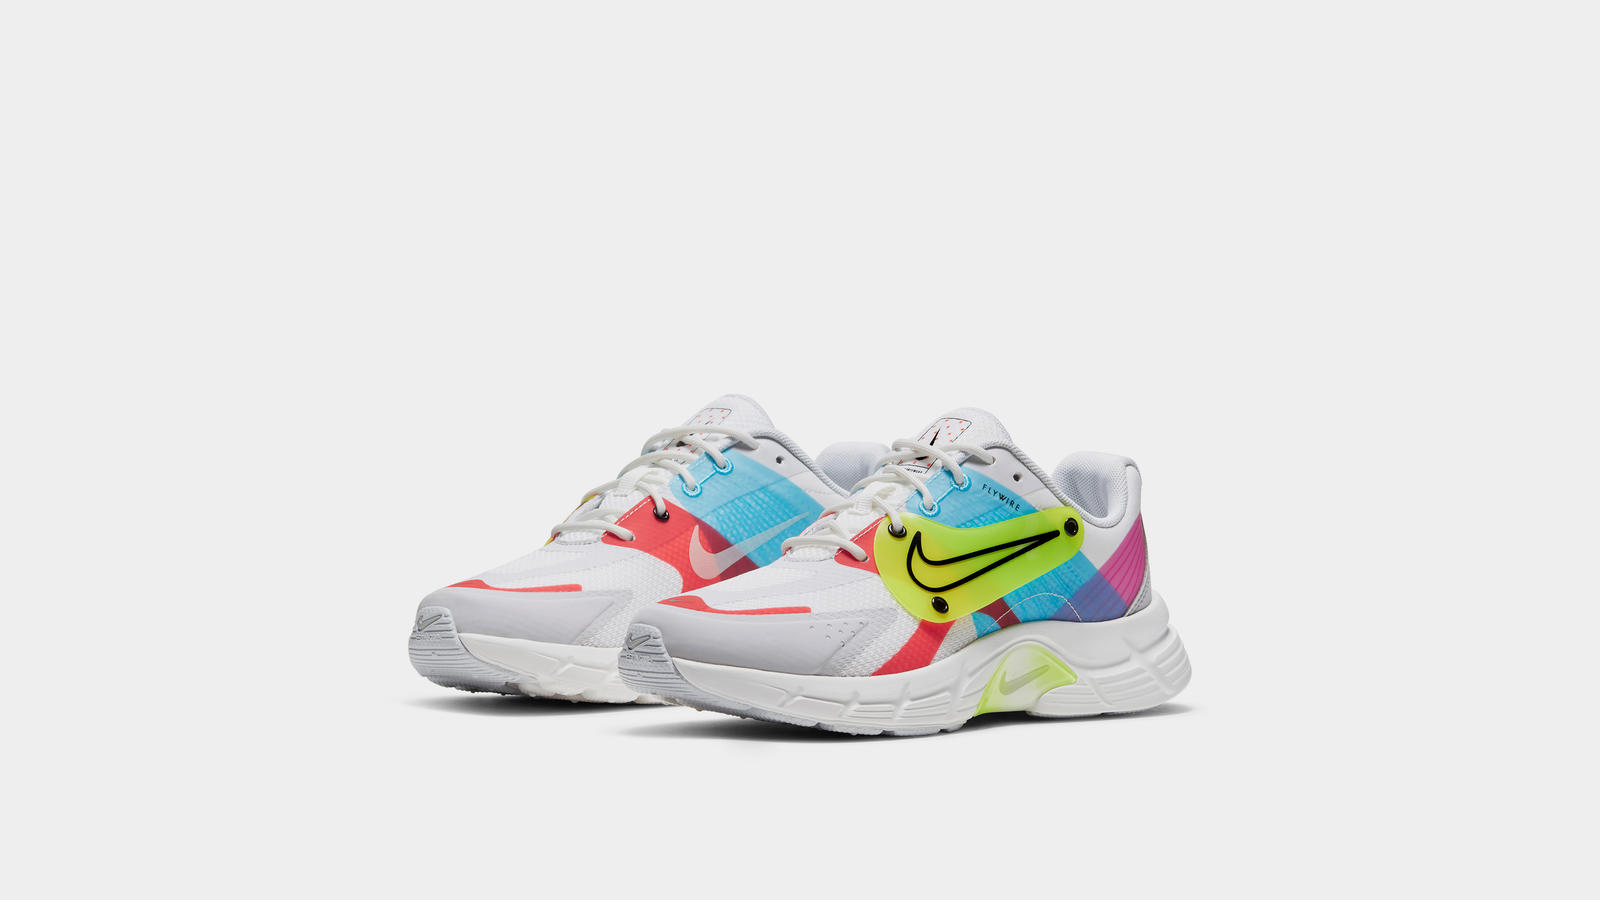 Nike Alphina 5000 11